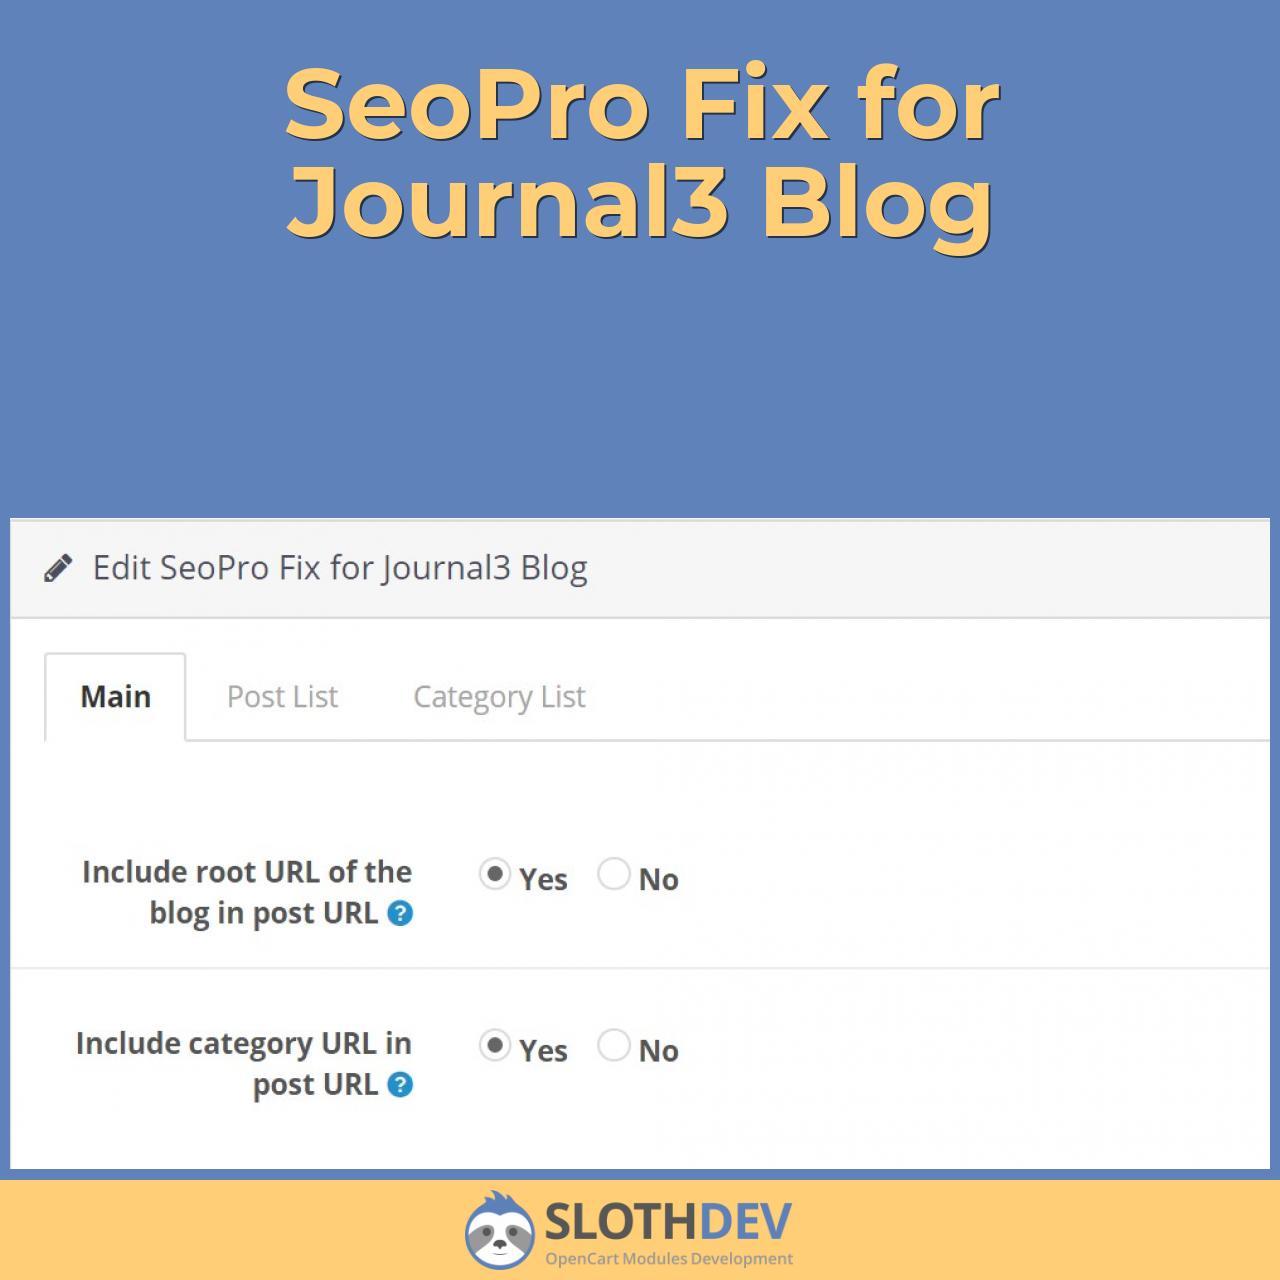 SeoPro Fix for Journal3 Blog